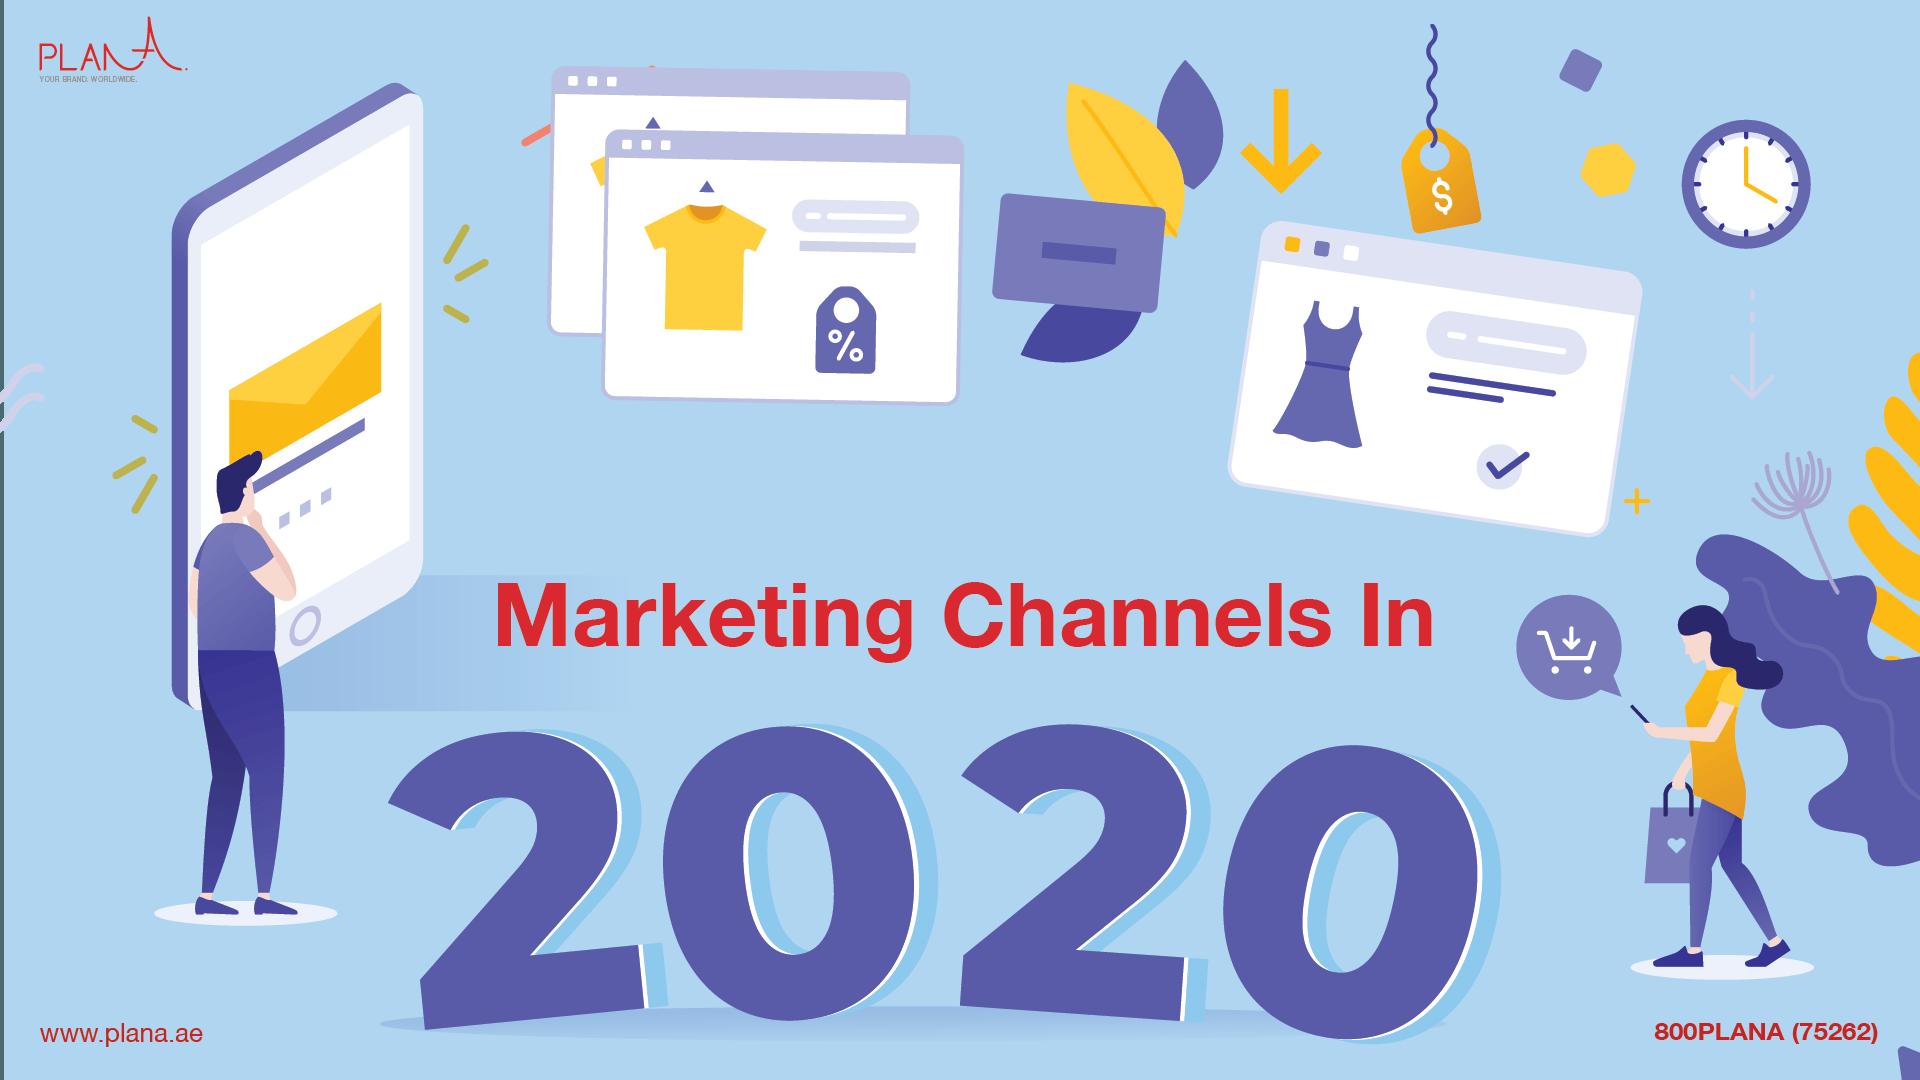 3 Essential Digital Marketing Channels in 2020